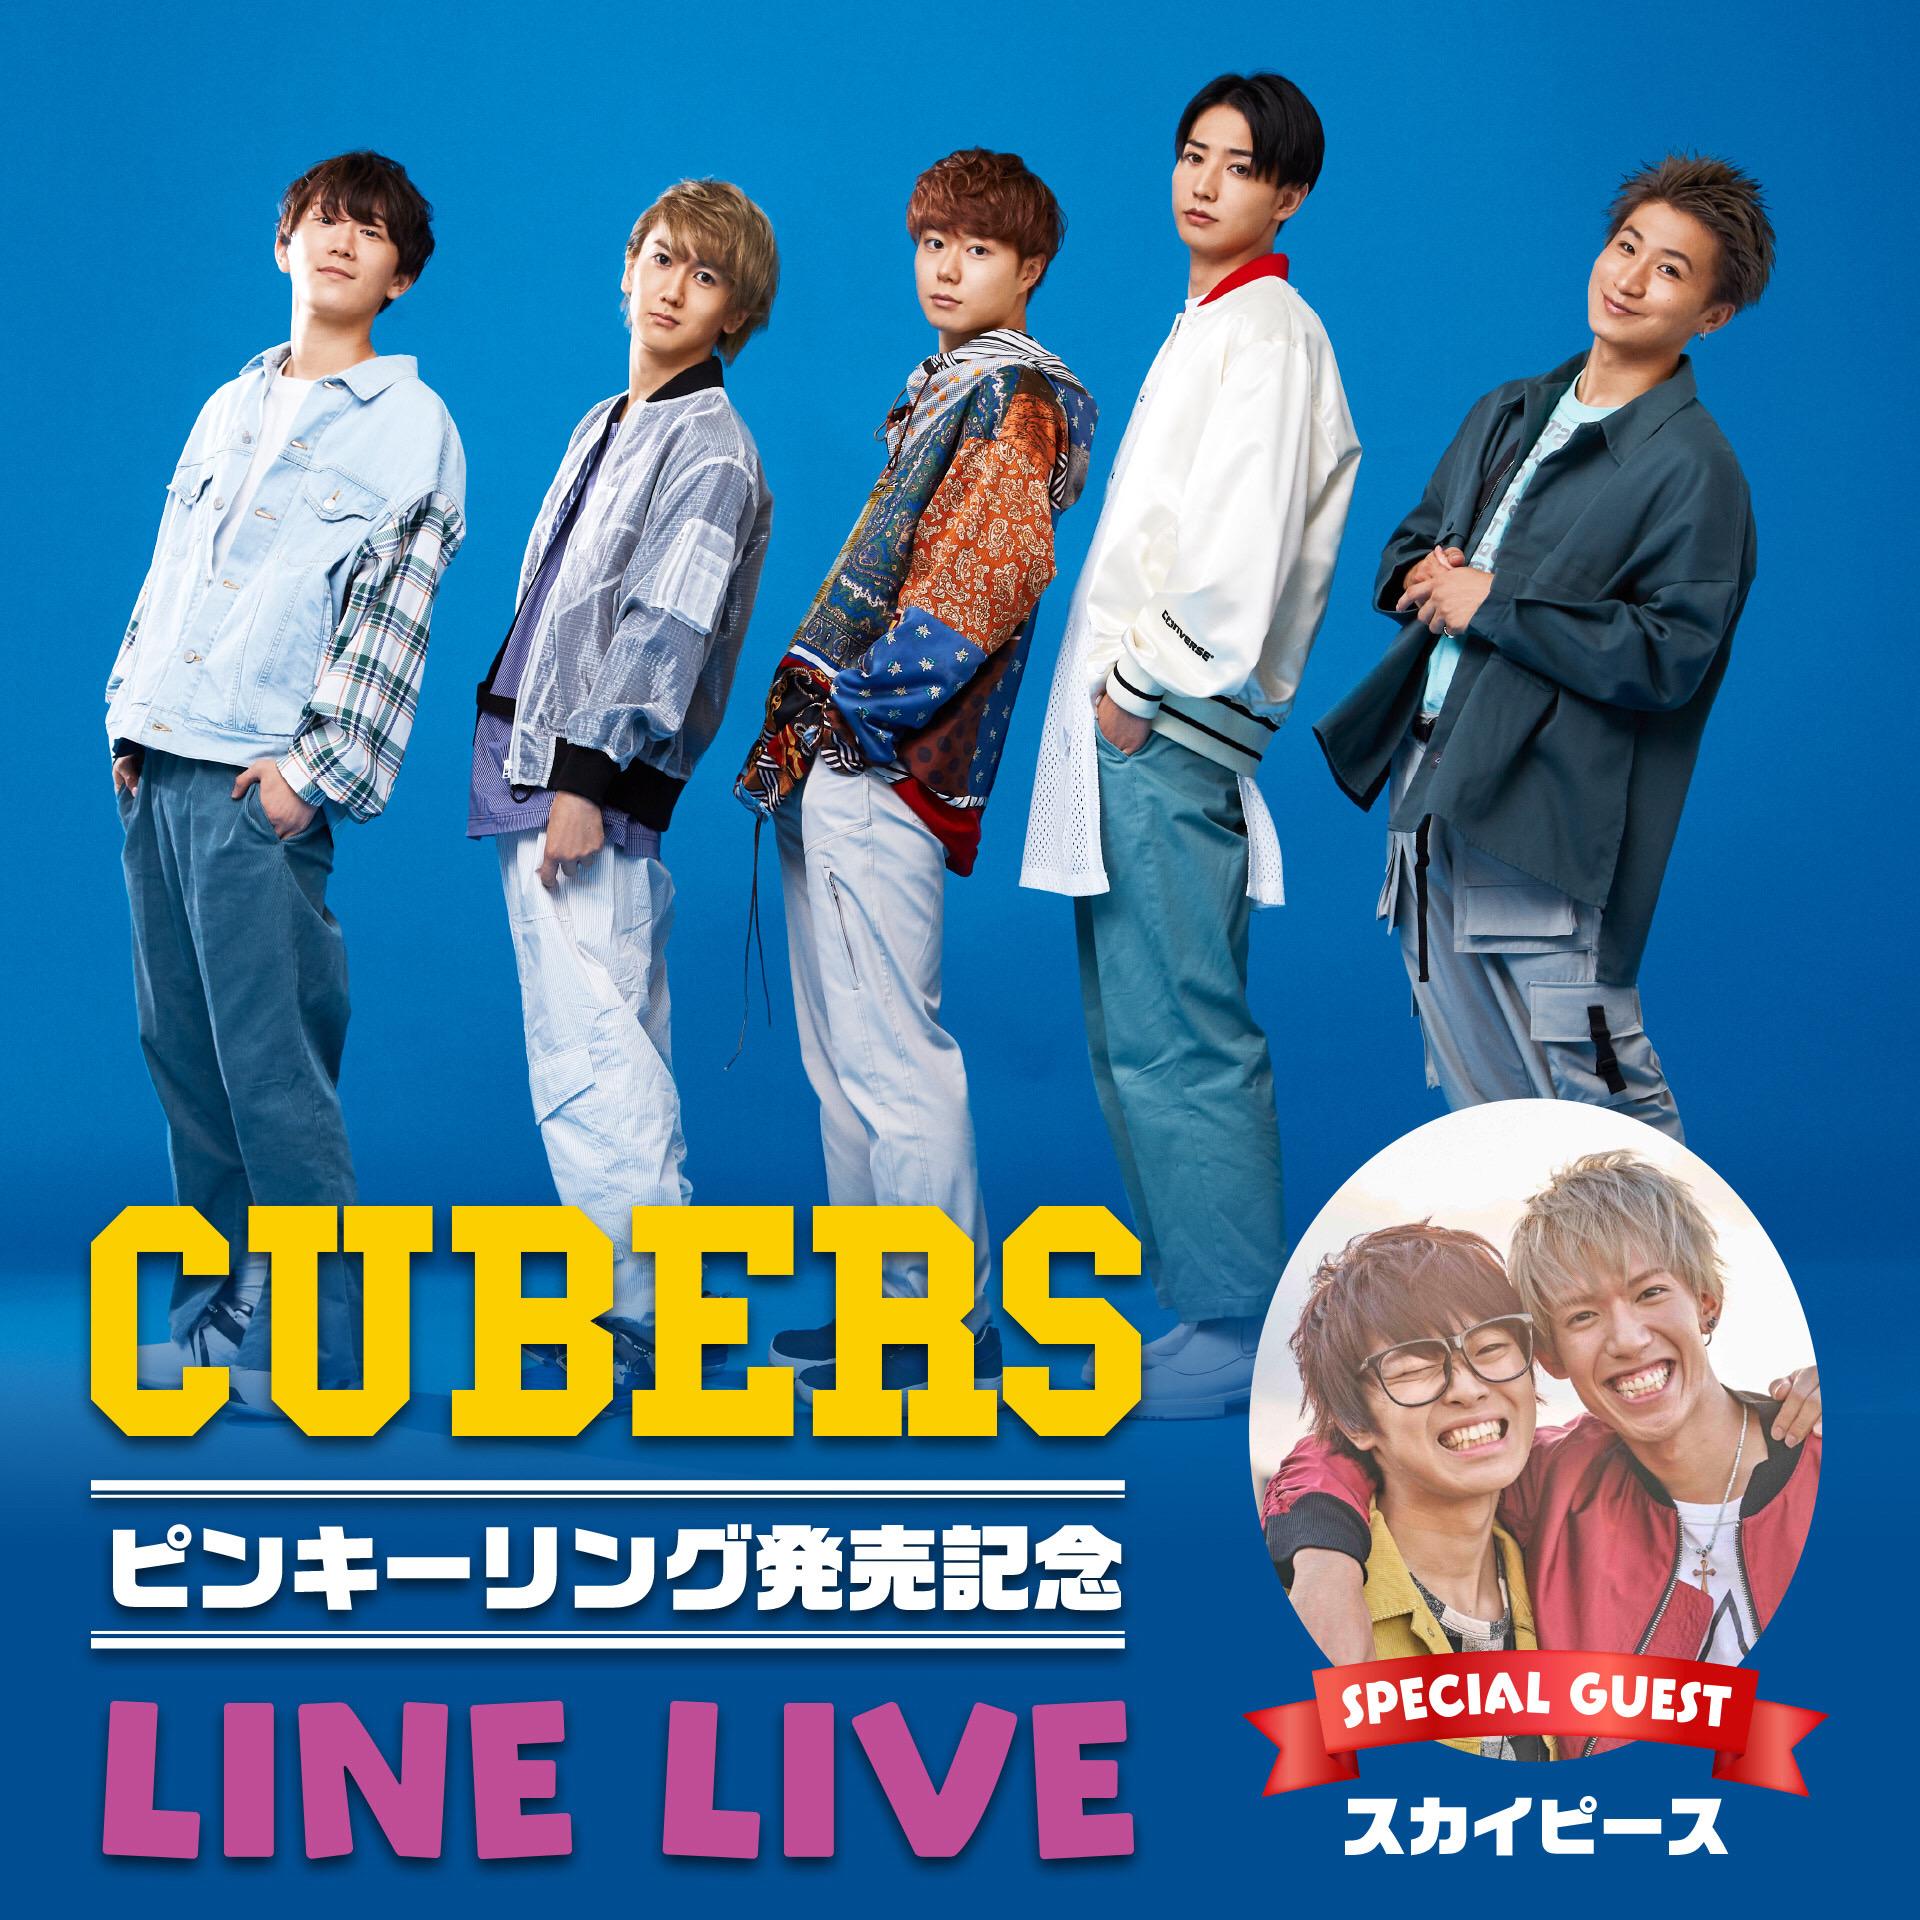 【NEWS】11/11(水)「ピンキーリング」発売日にLINE LIVEでスペシャル番組の生配信決定! ゲストにスカイピース登場!